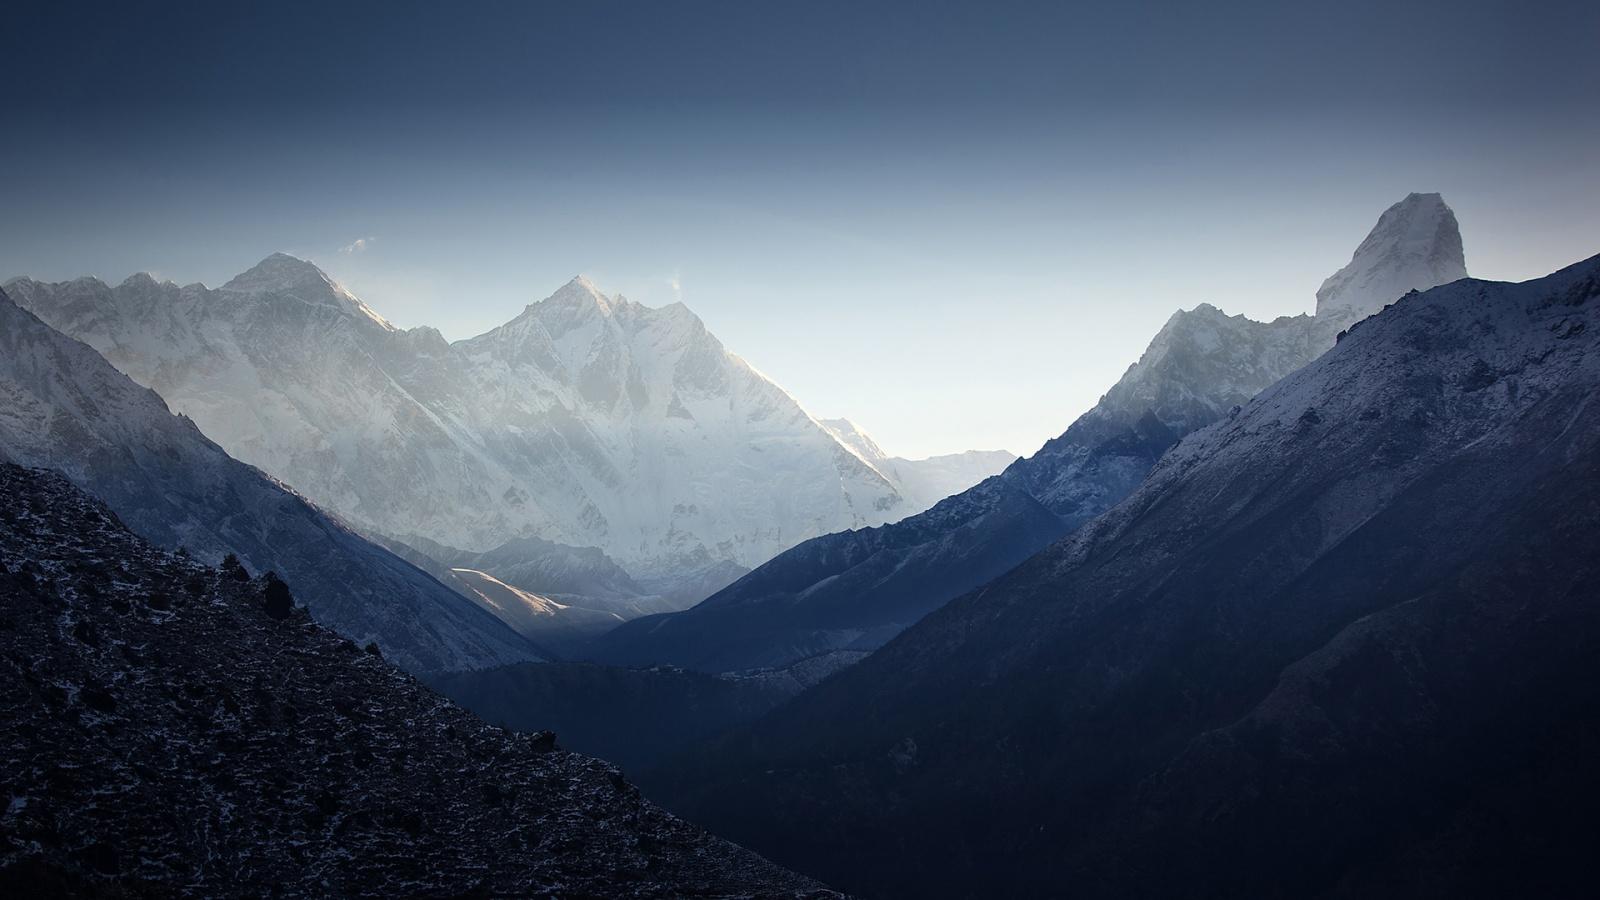 ... himalayas-mountain-valley-wallpaper-widescreen-background ...